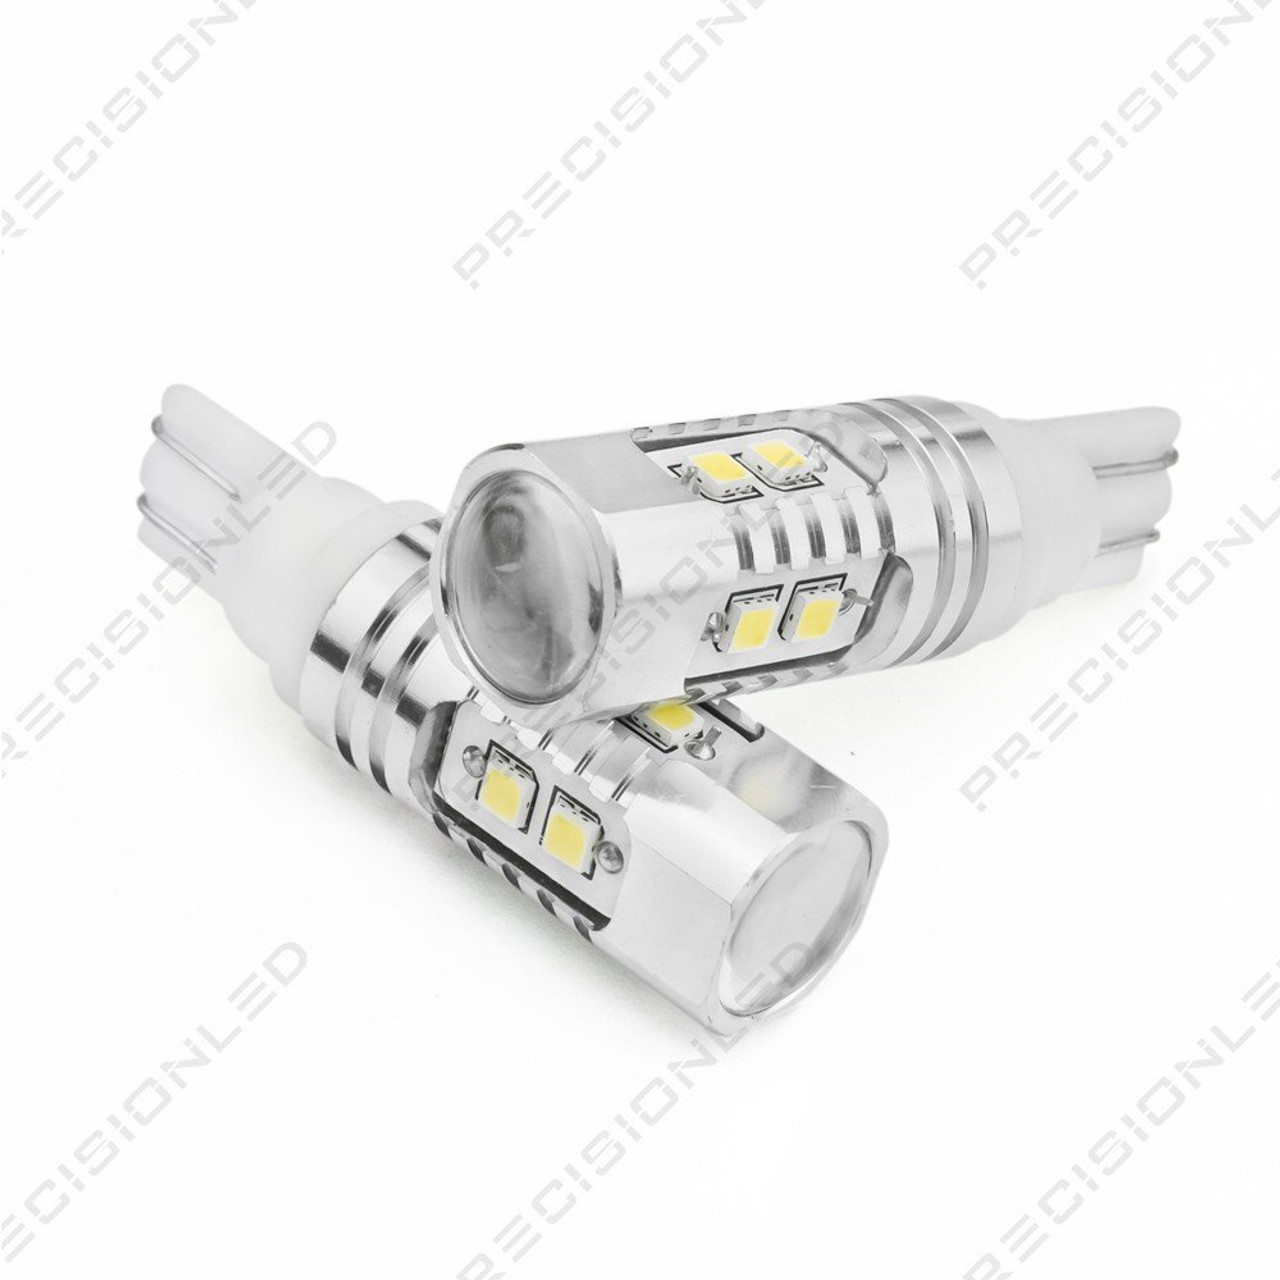 Cadillac Escalade LED Backup Reverse Lights (2007-Present)